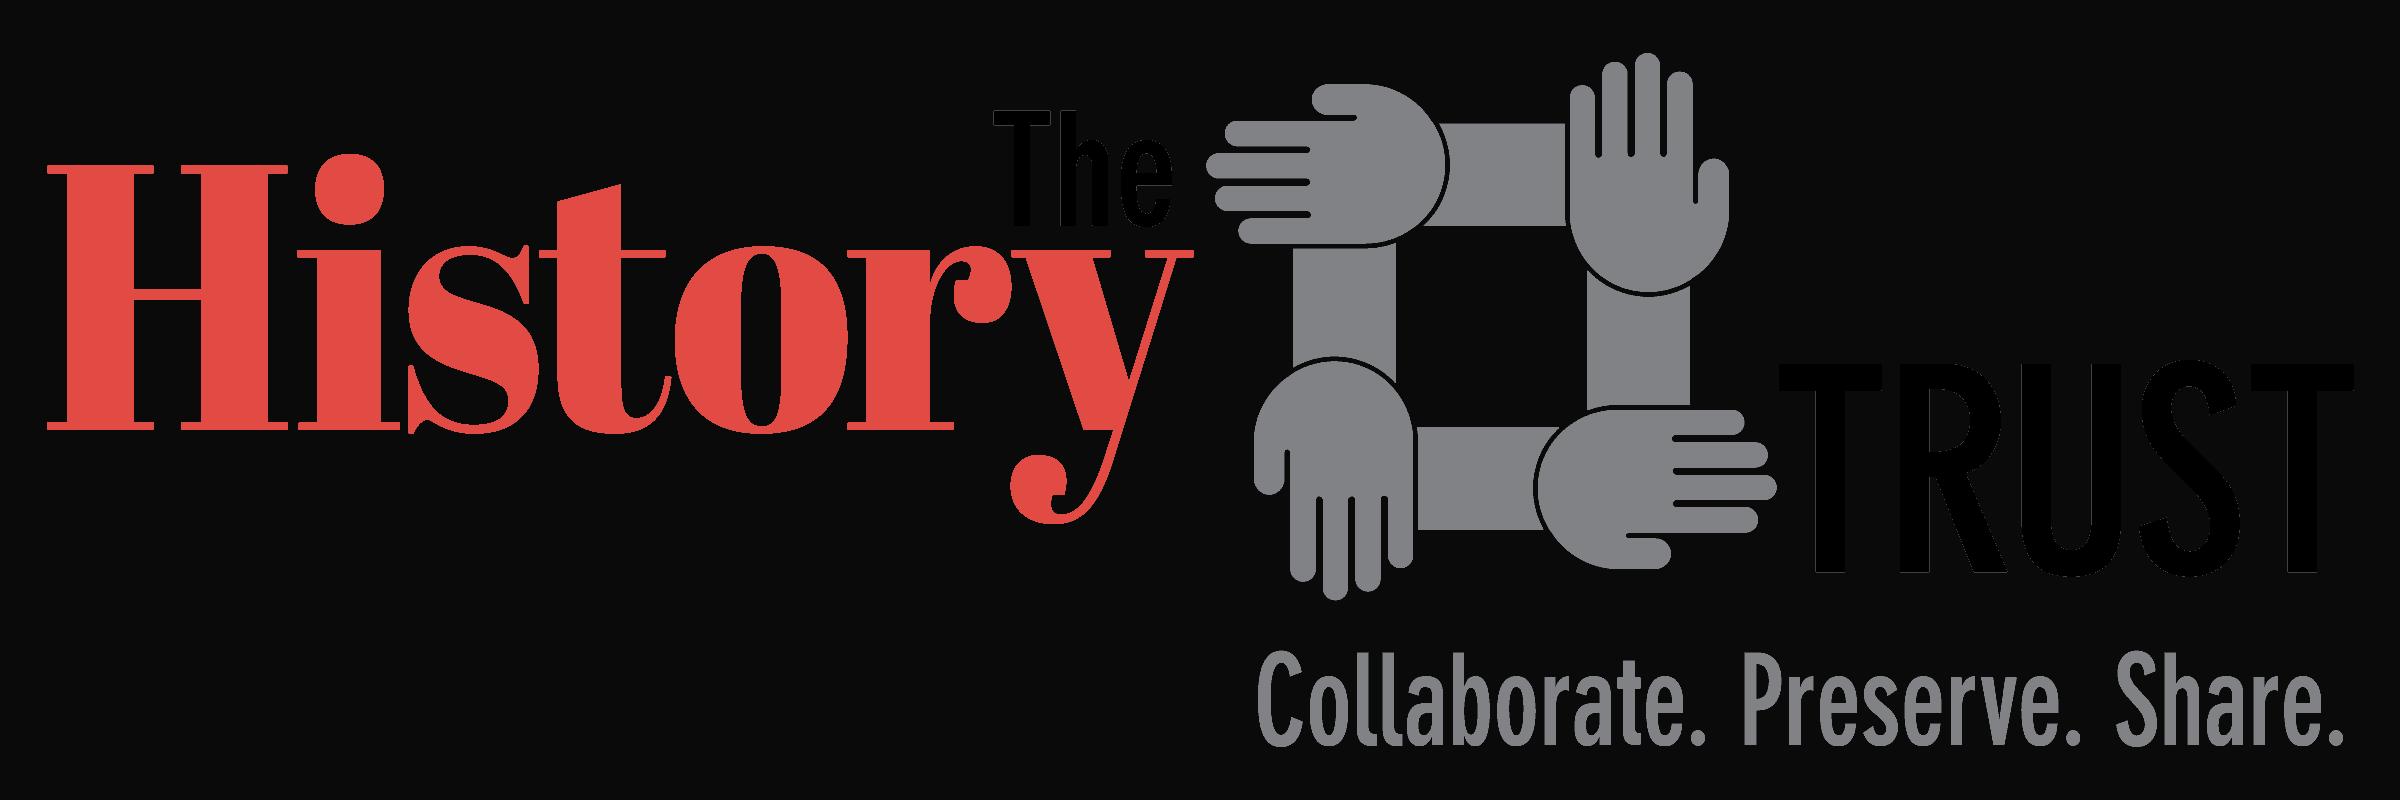 The History Trust: collaborate, preserve, share.